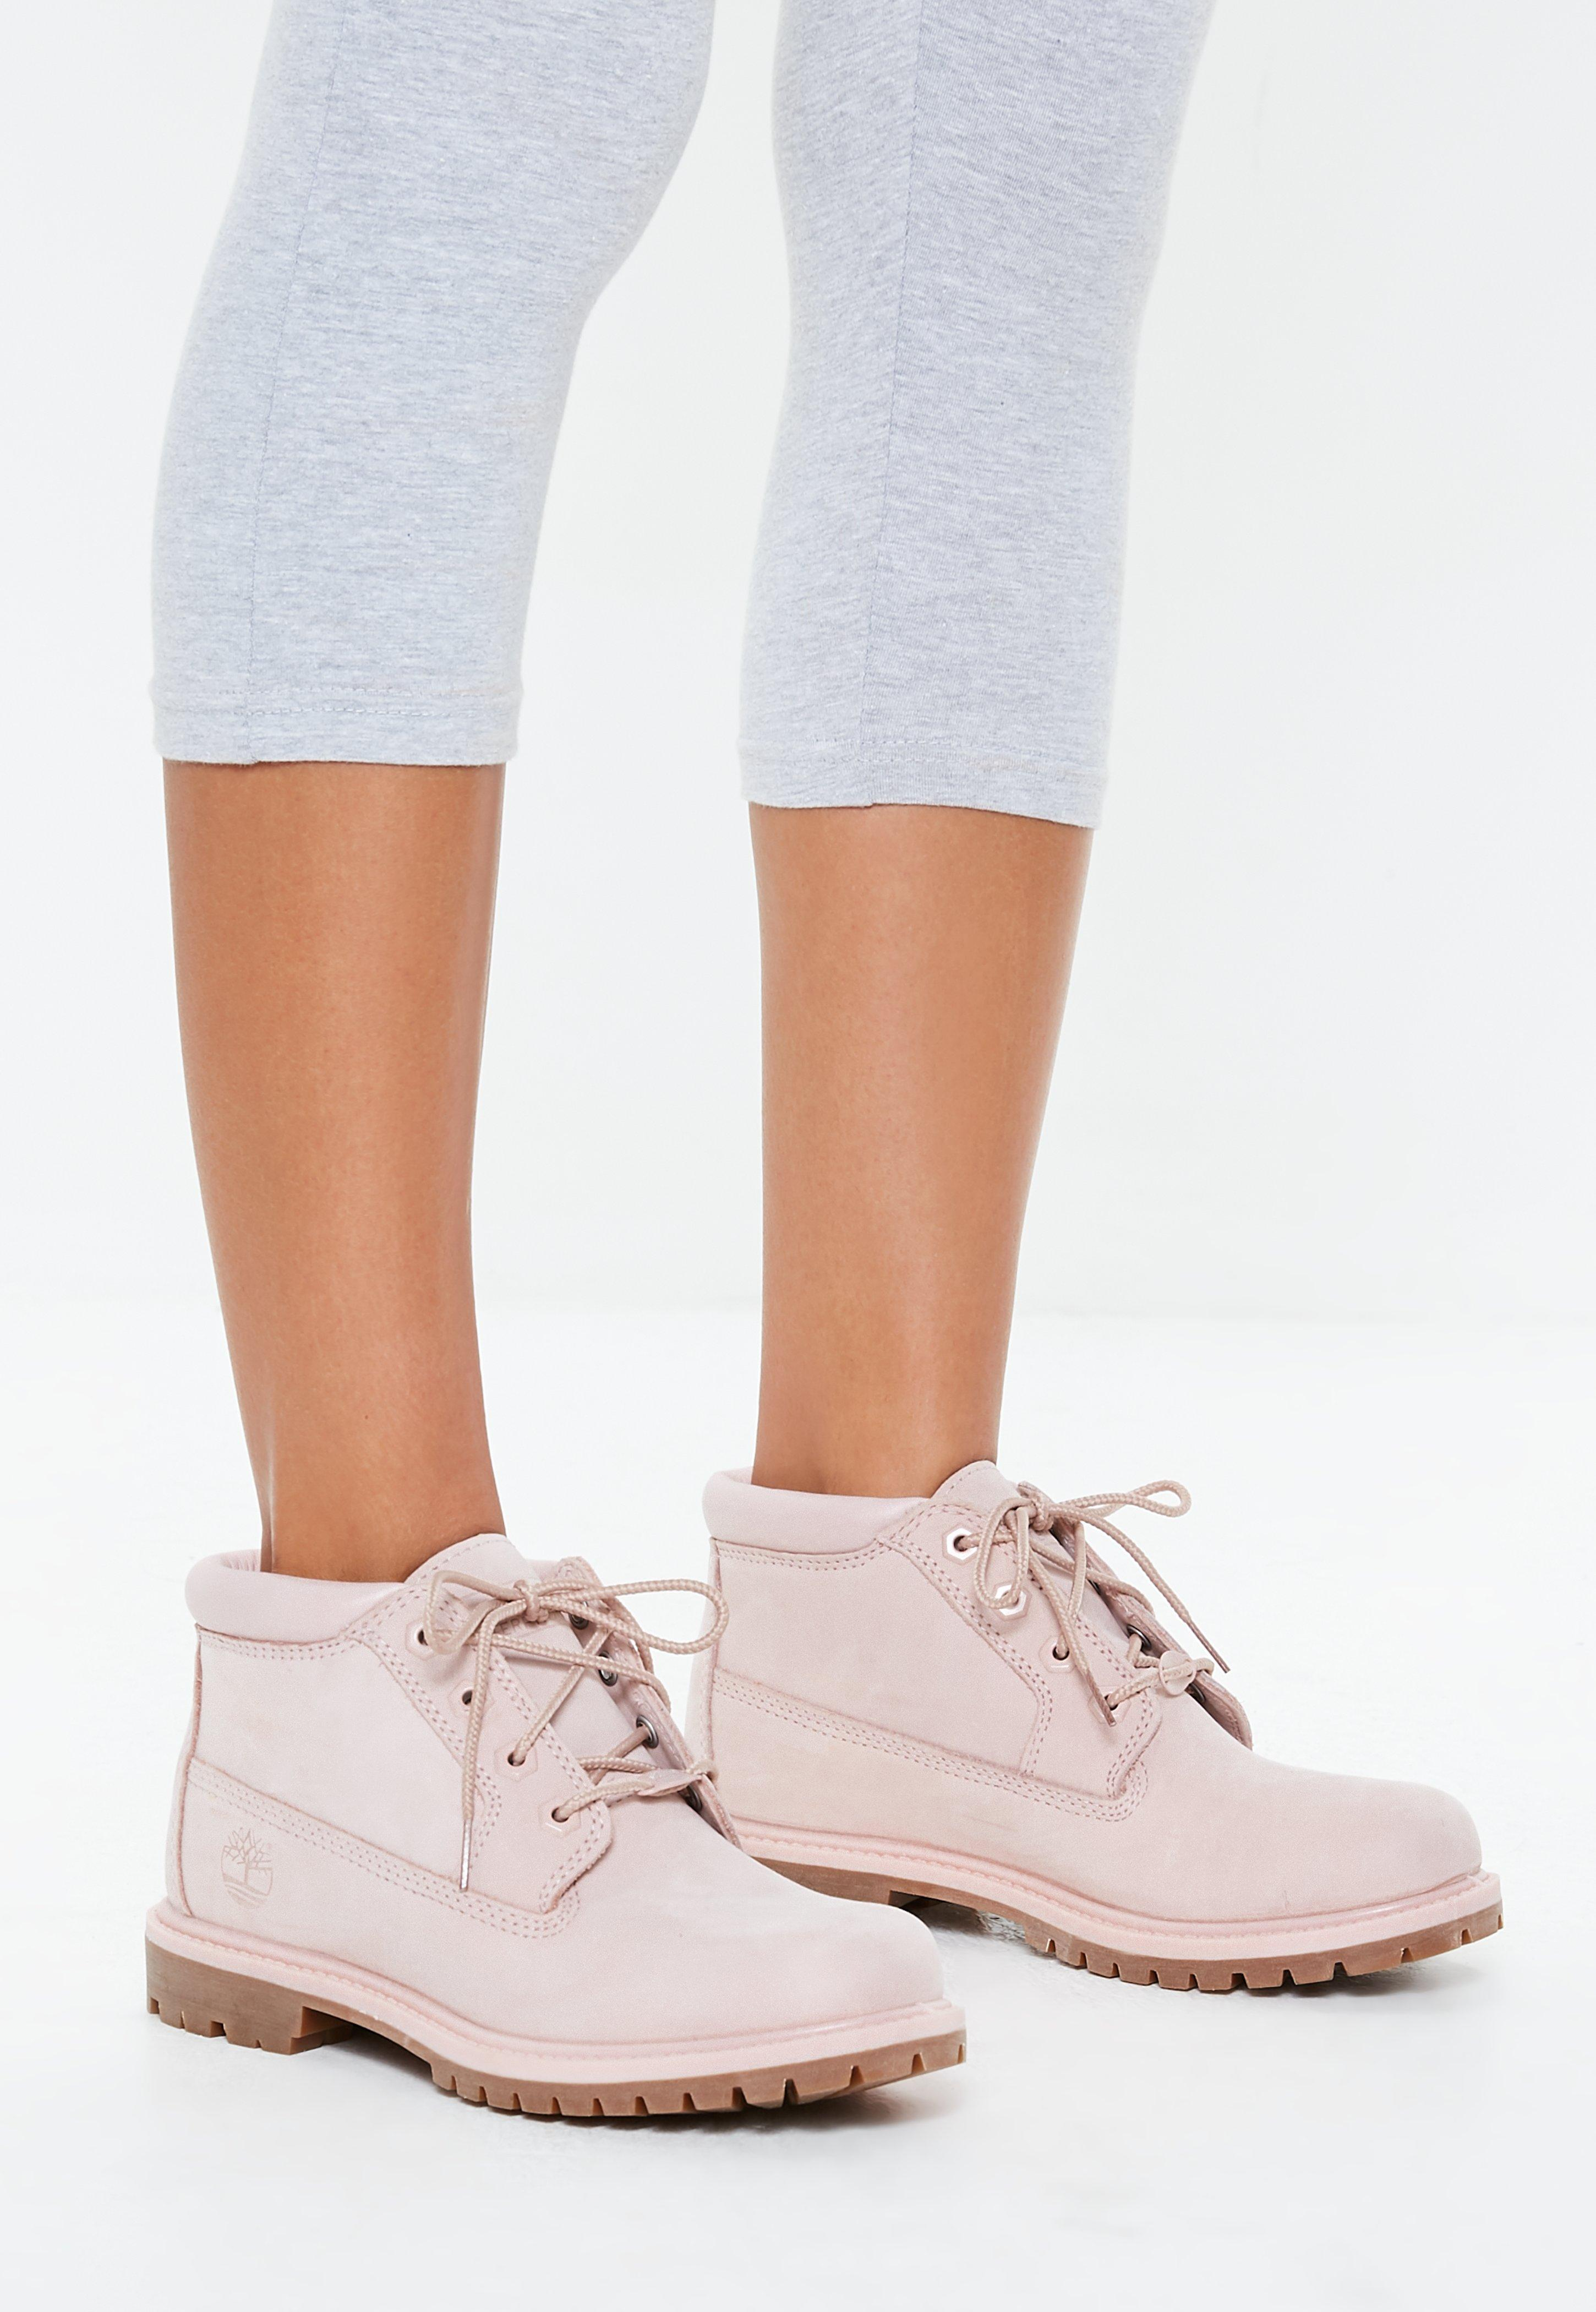 tienda del reino unido bien baratas 2019 mejor Missguided Leather Timberland Pink Nellie Chukka Boots - Lyst